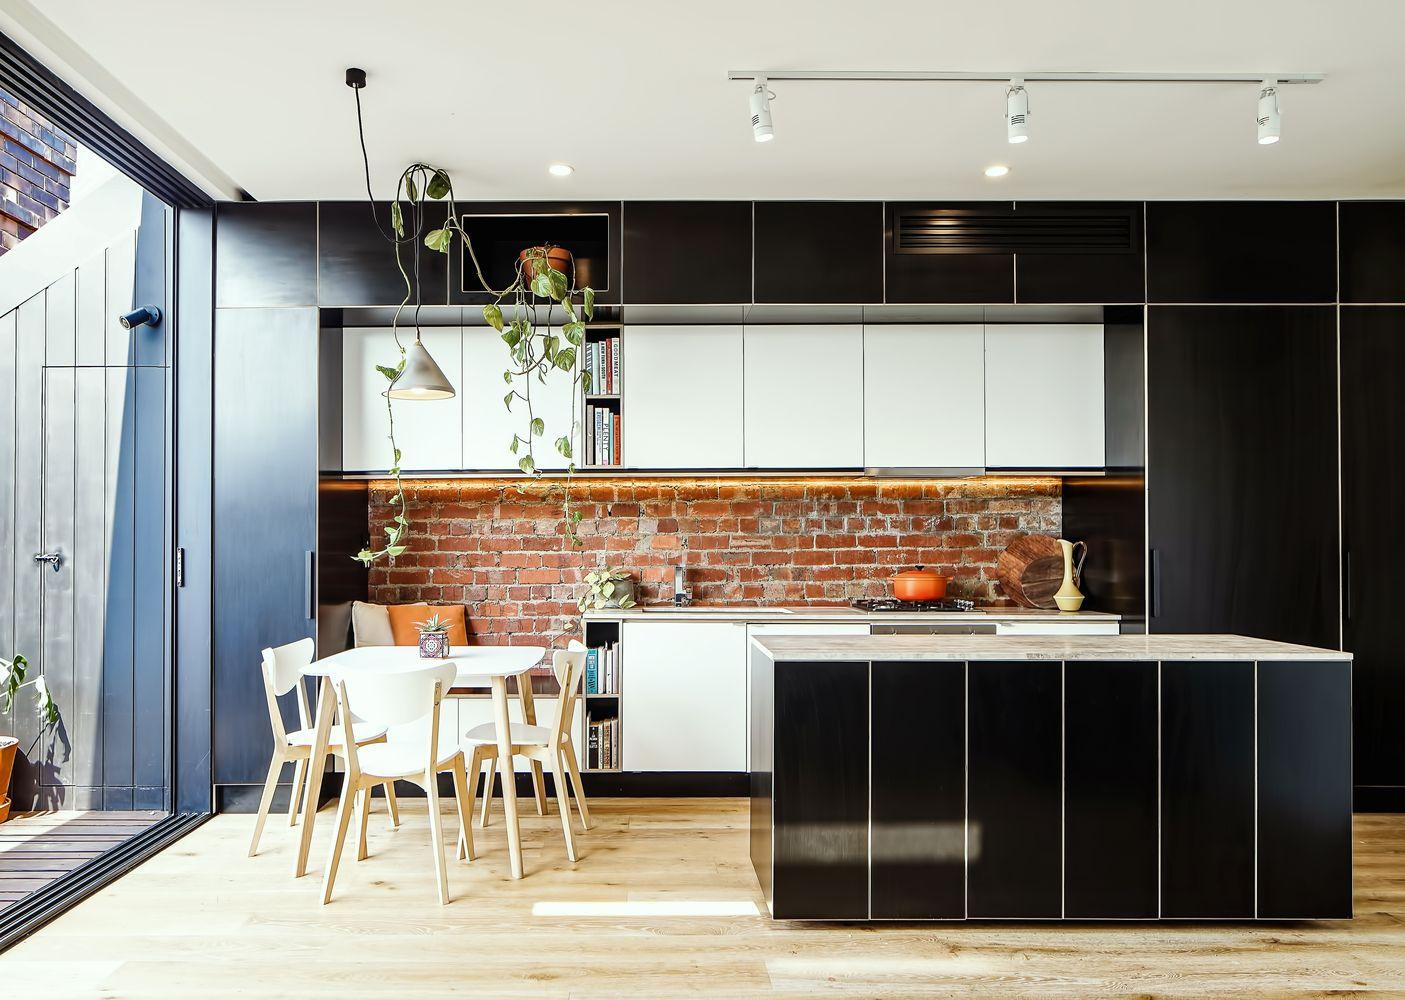 Gallery Of H I V E X Five Megowan Architectural 5 Kitchen Design Kitchen Interior Black Kitchen Cabinets